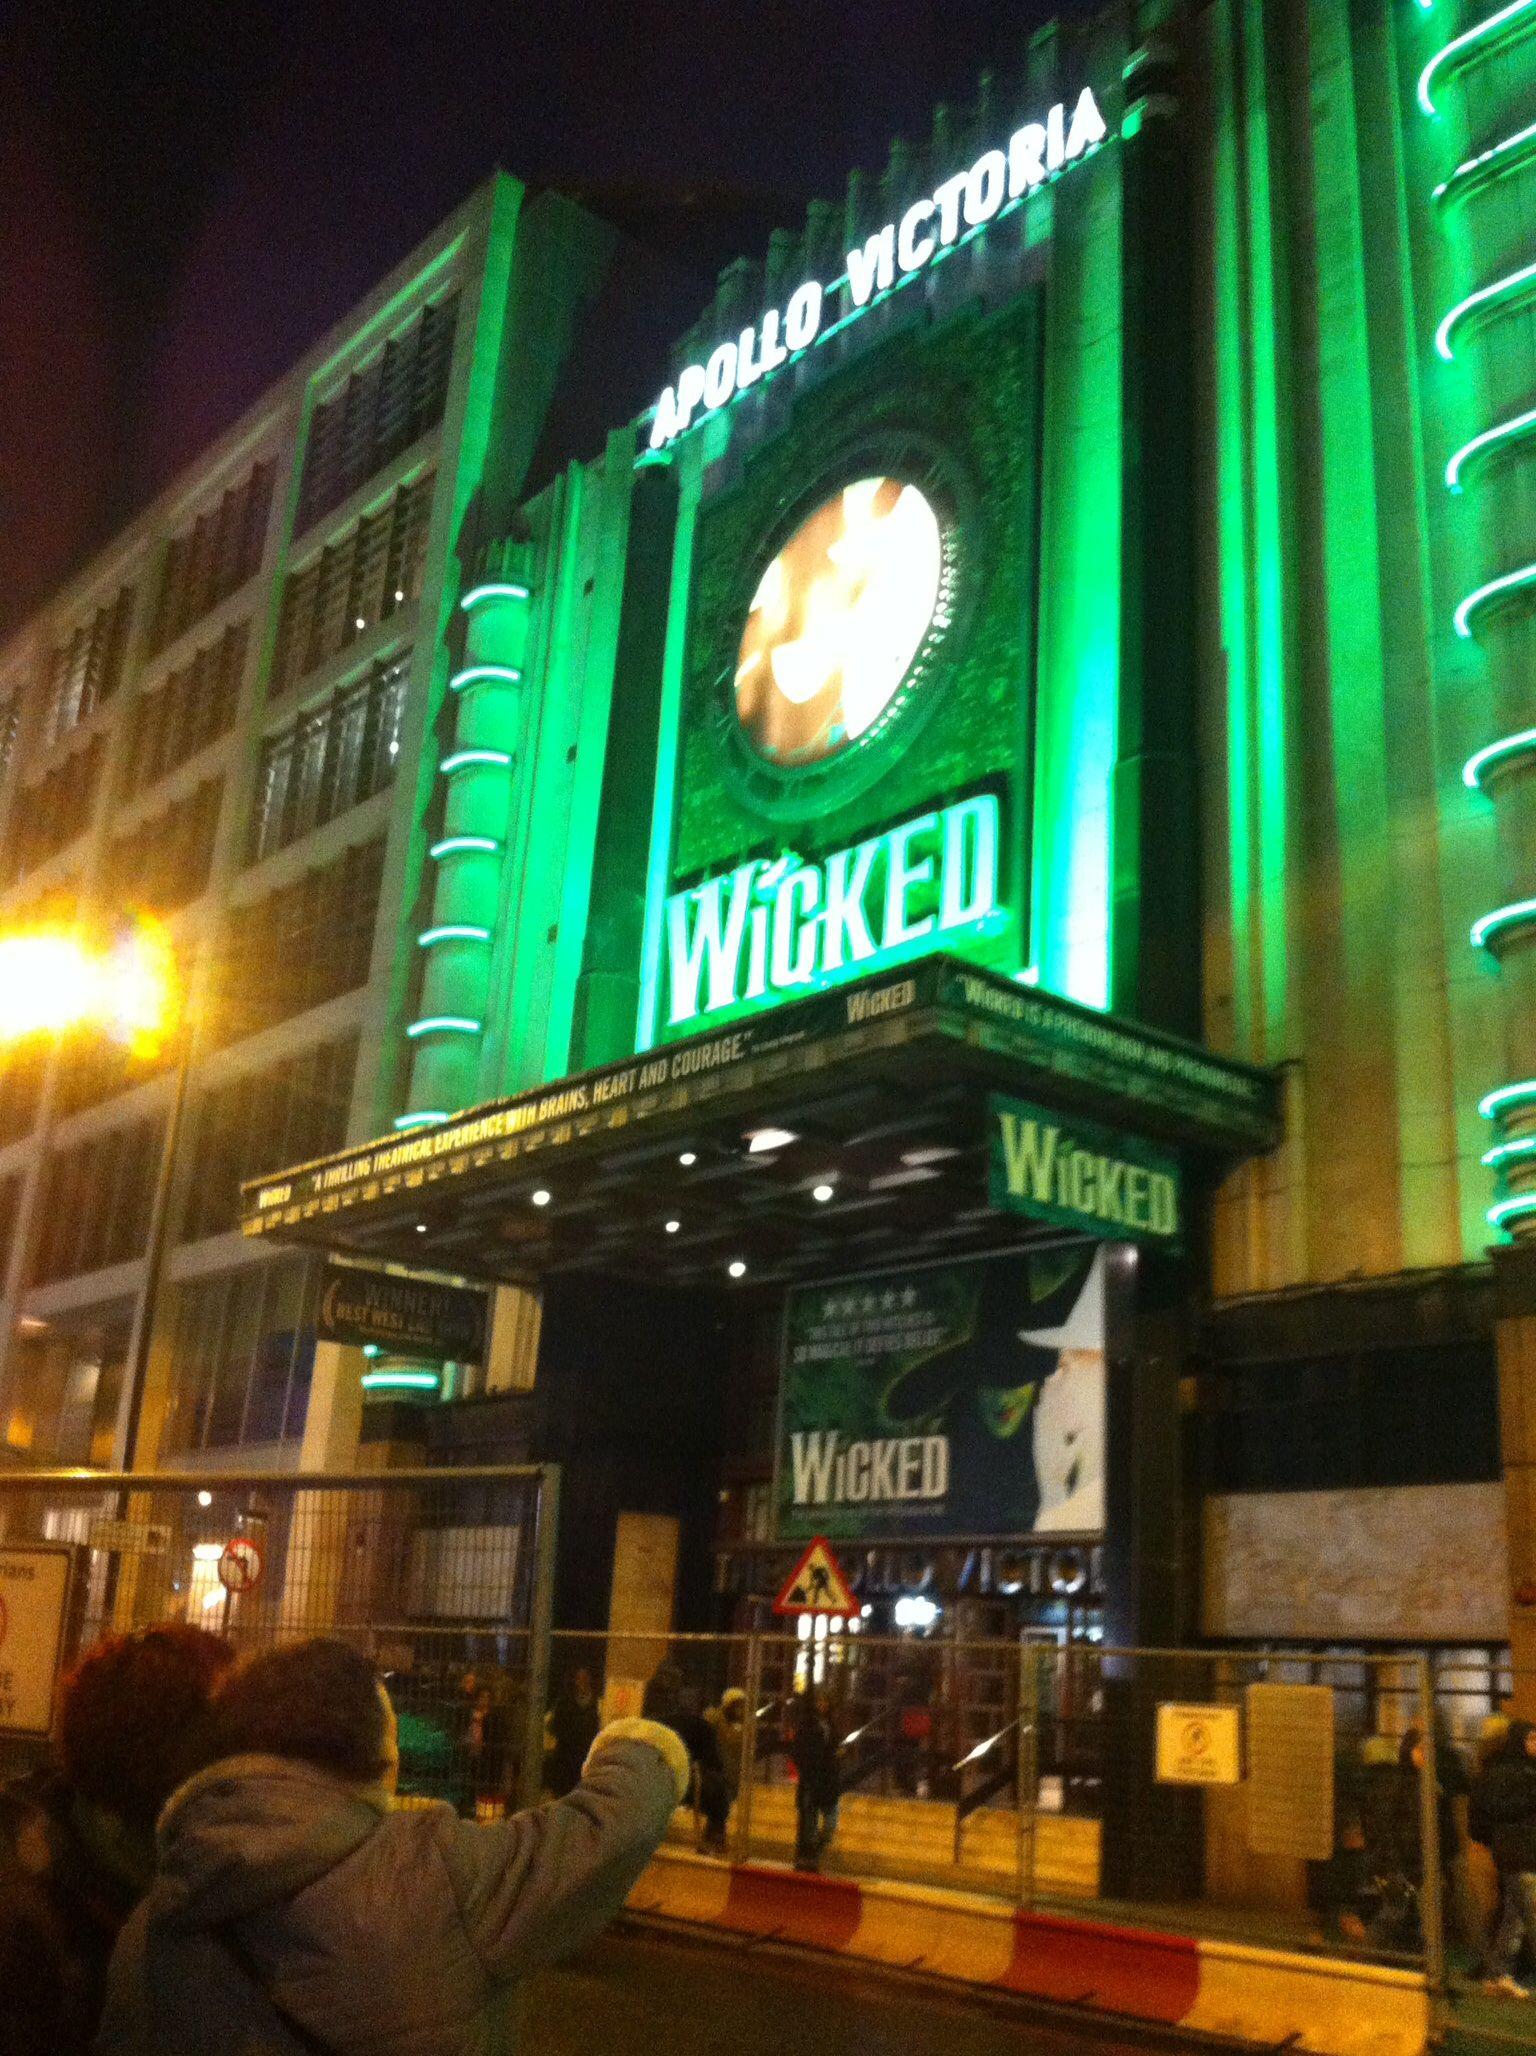 Wicked! London